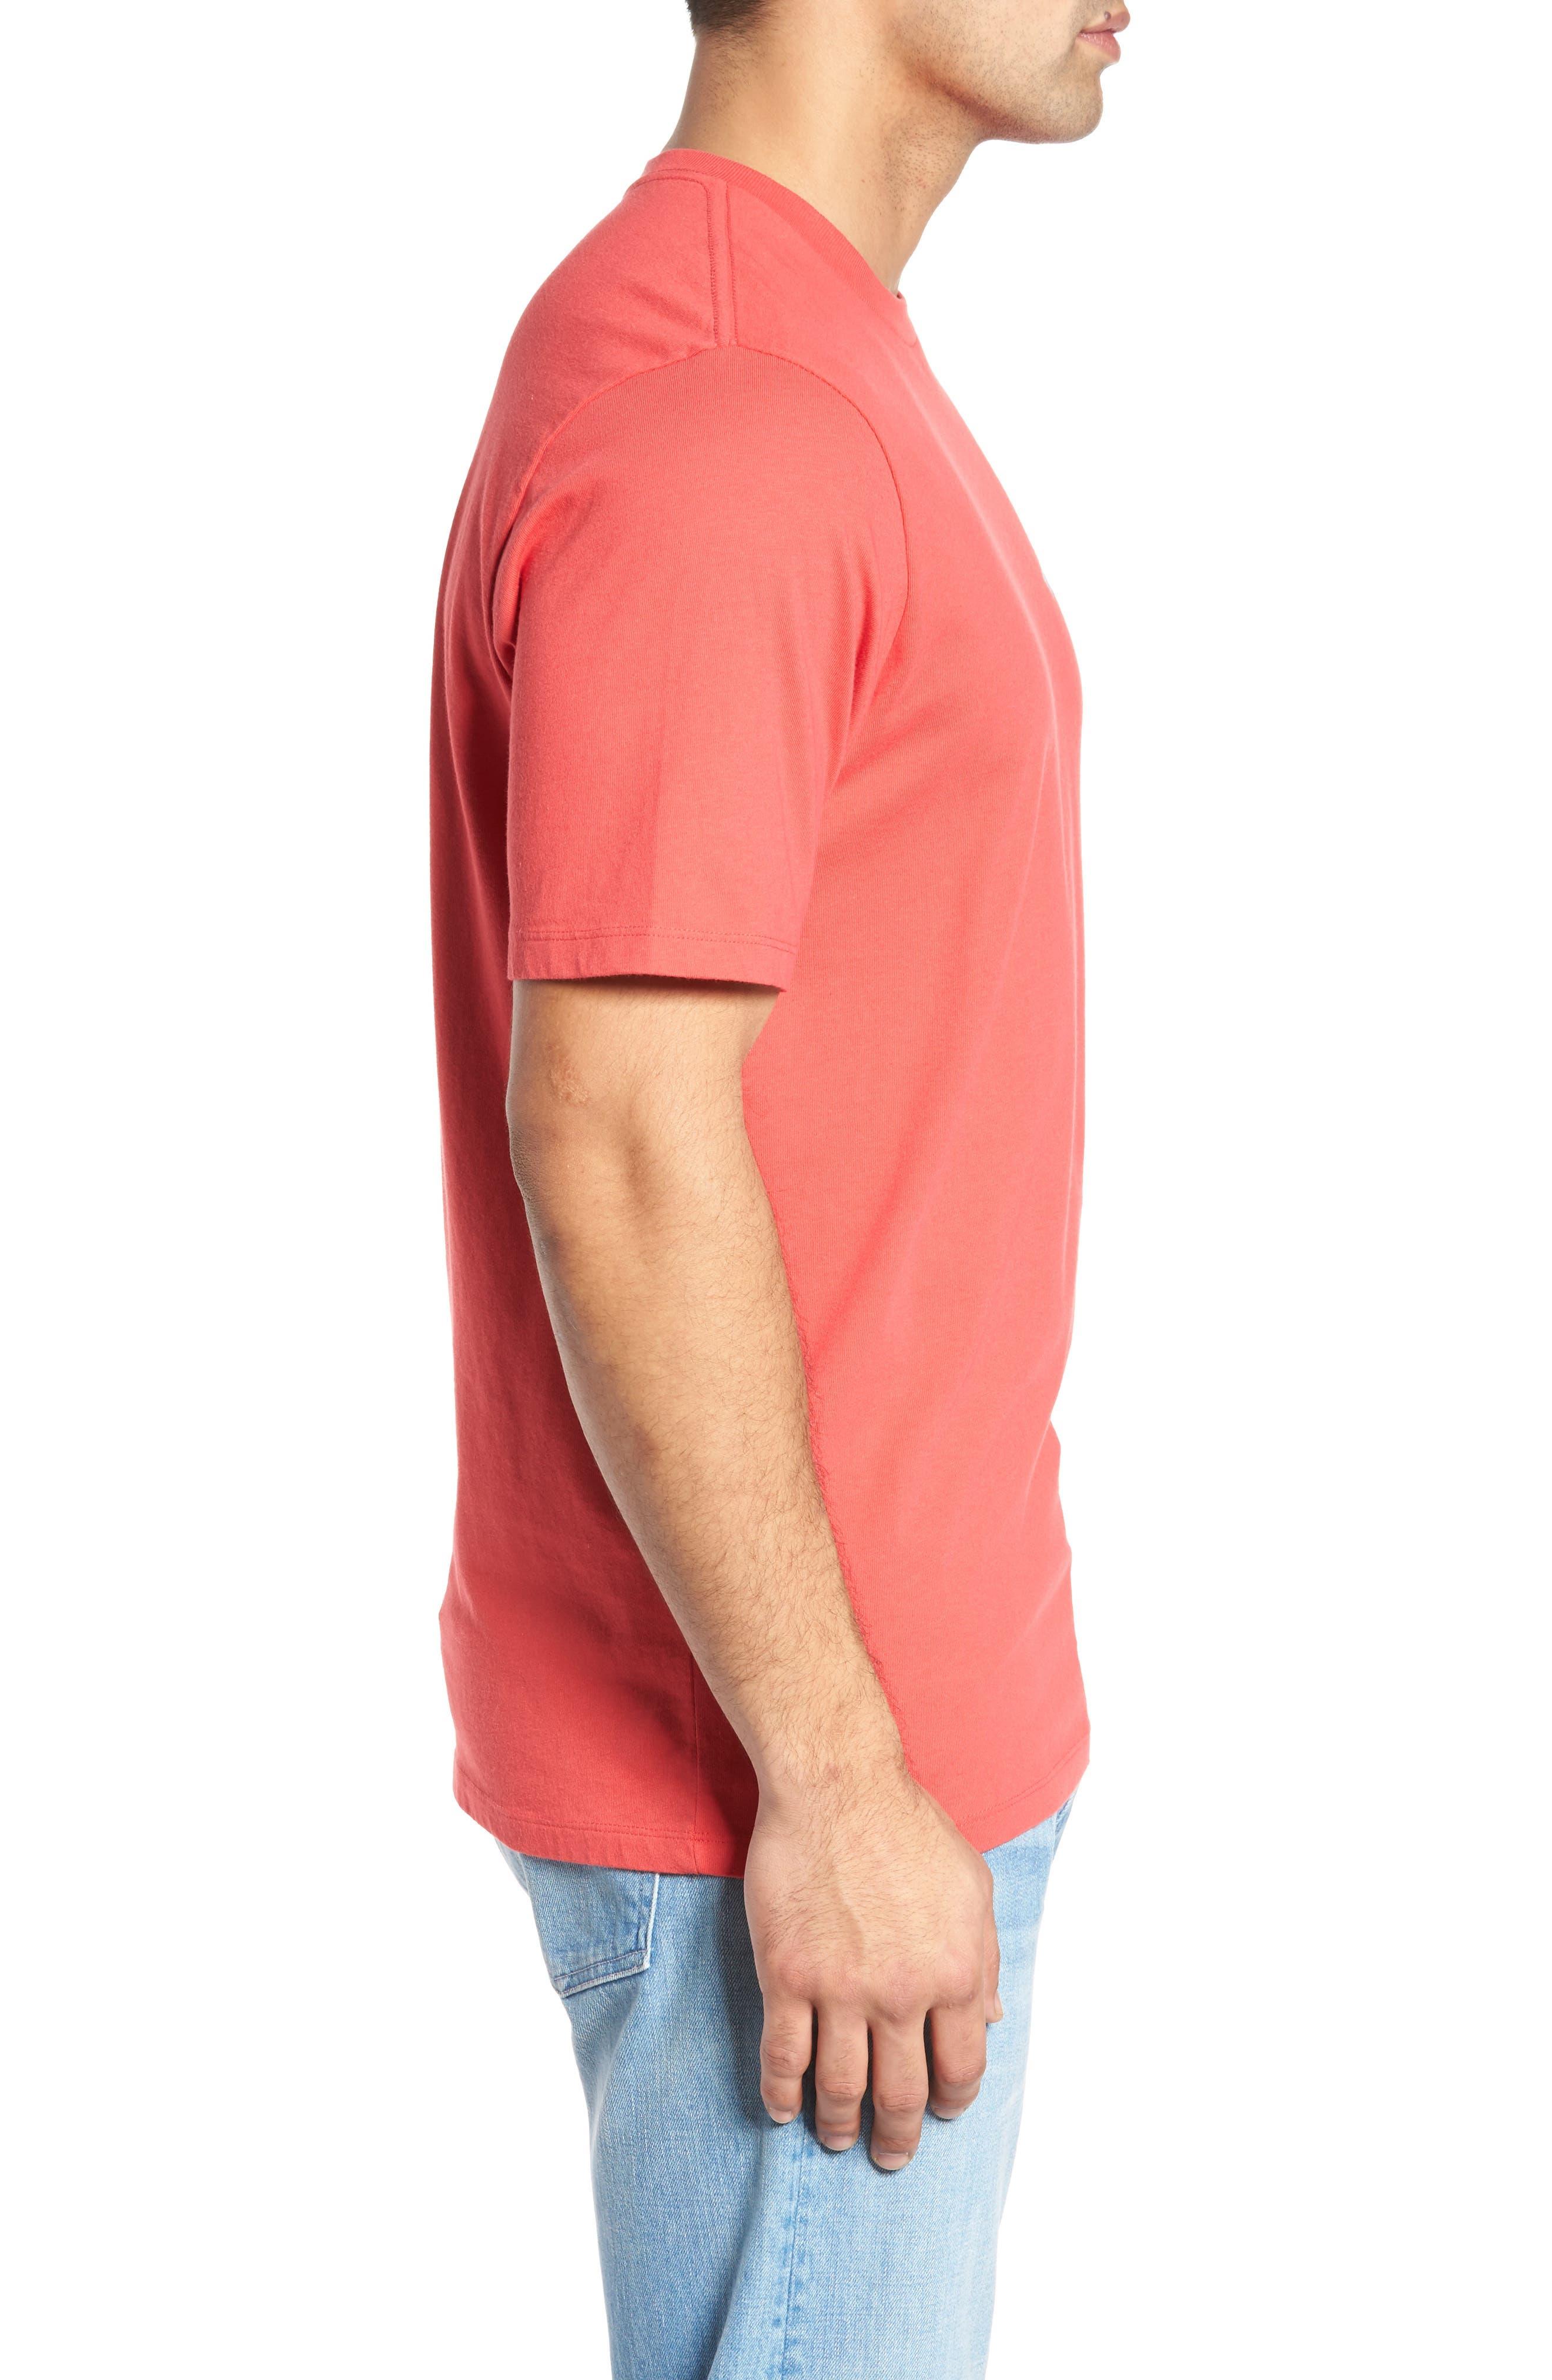 Grate Outdoors T-Shirt,                             Alternate thumbnail 3, color,                             600